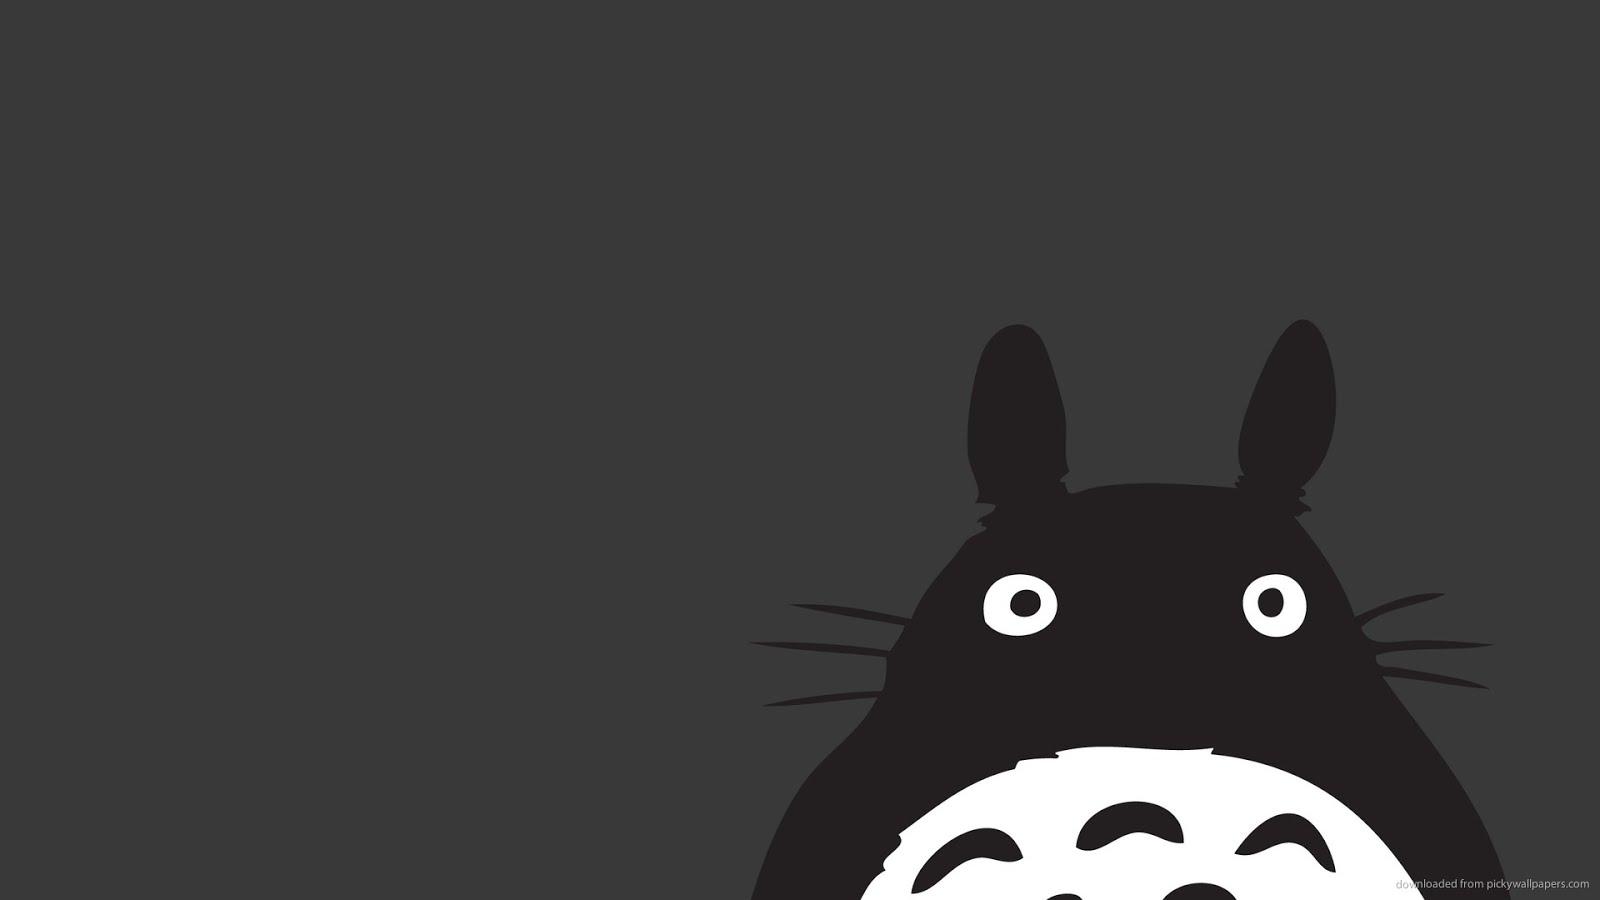 Wonderful   Wallpaper Horse Minimalist - Totoro  Best Photo Reference_906418.jpg